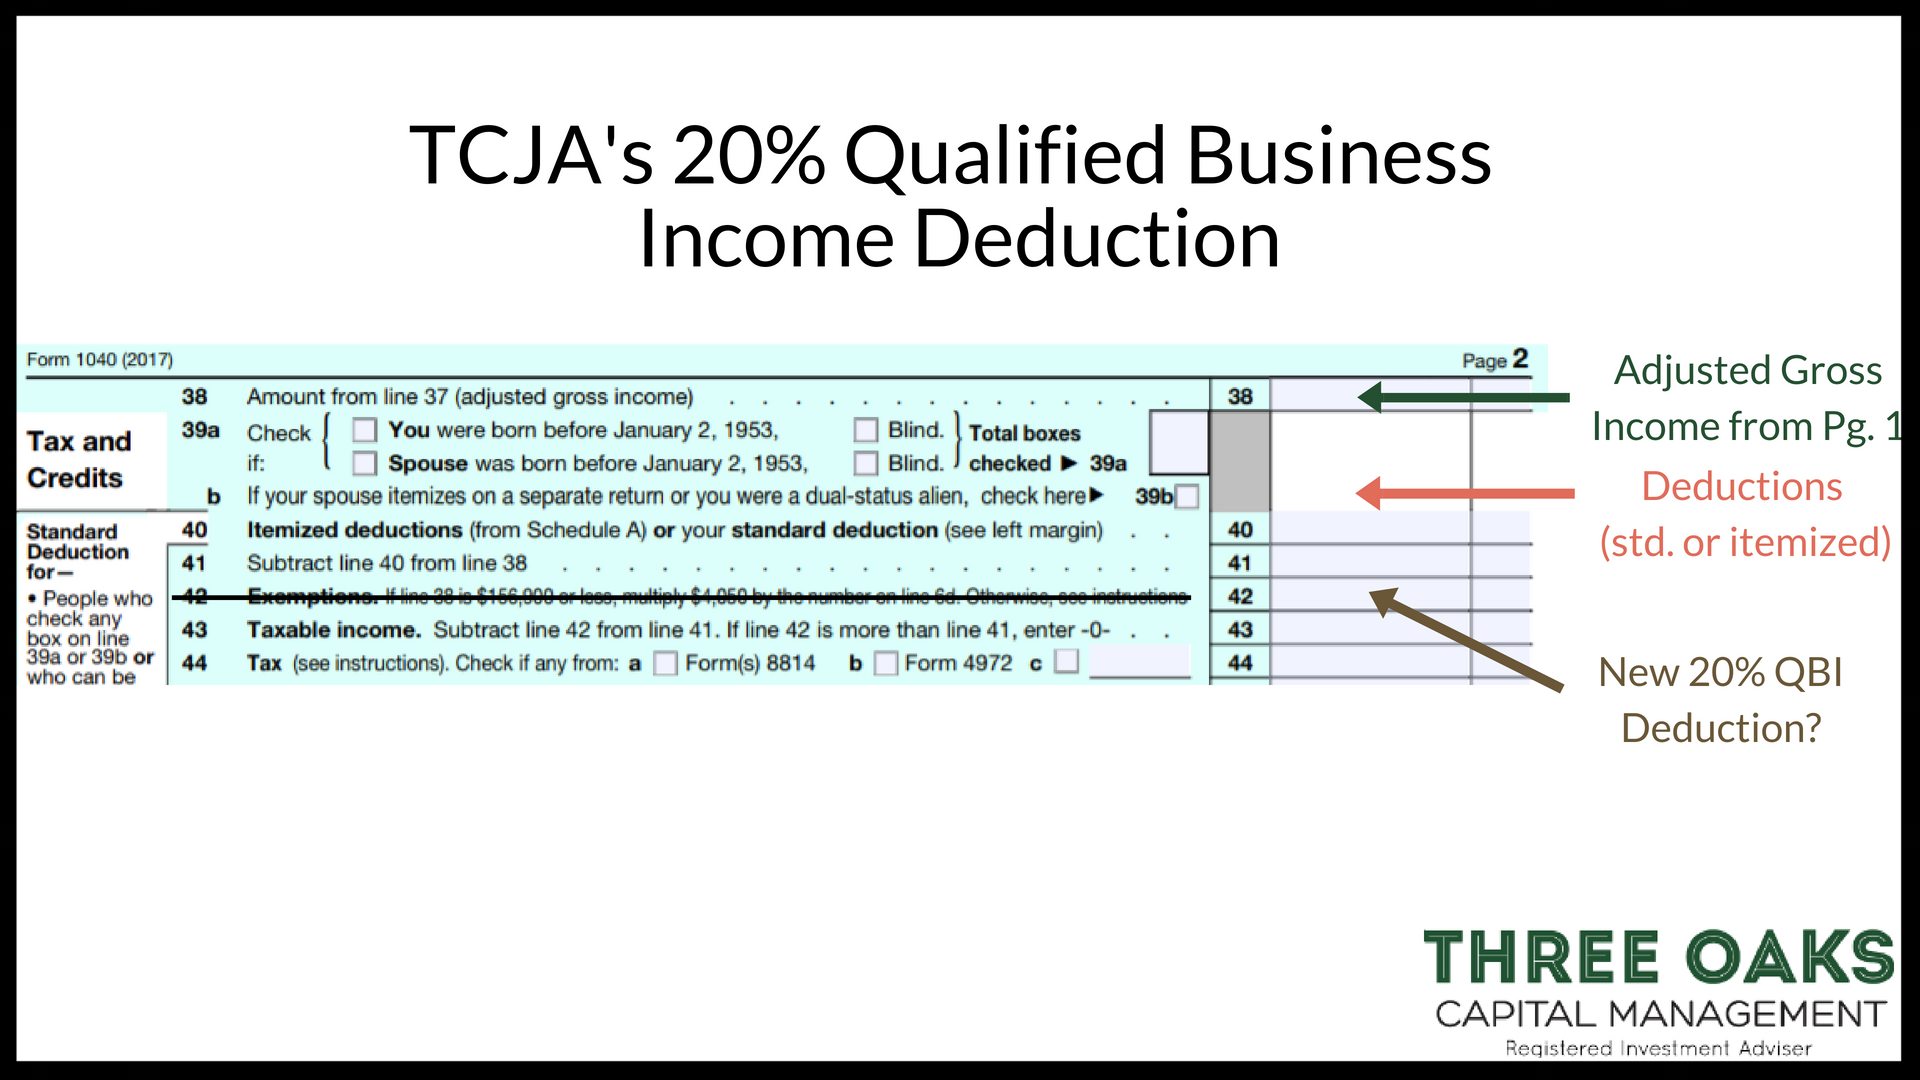 form 1040 qbi  Entity Selection & The Tax Cut & Jobs Act — Three Oaks ...